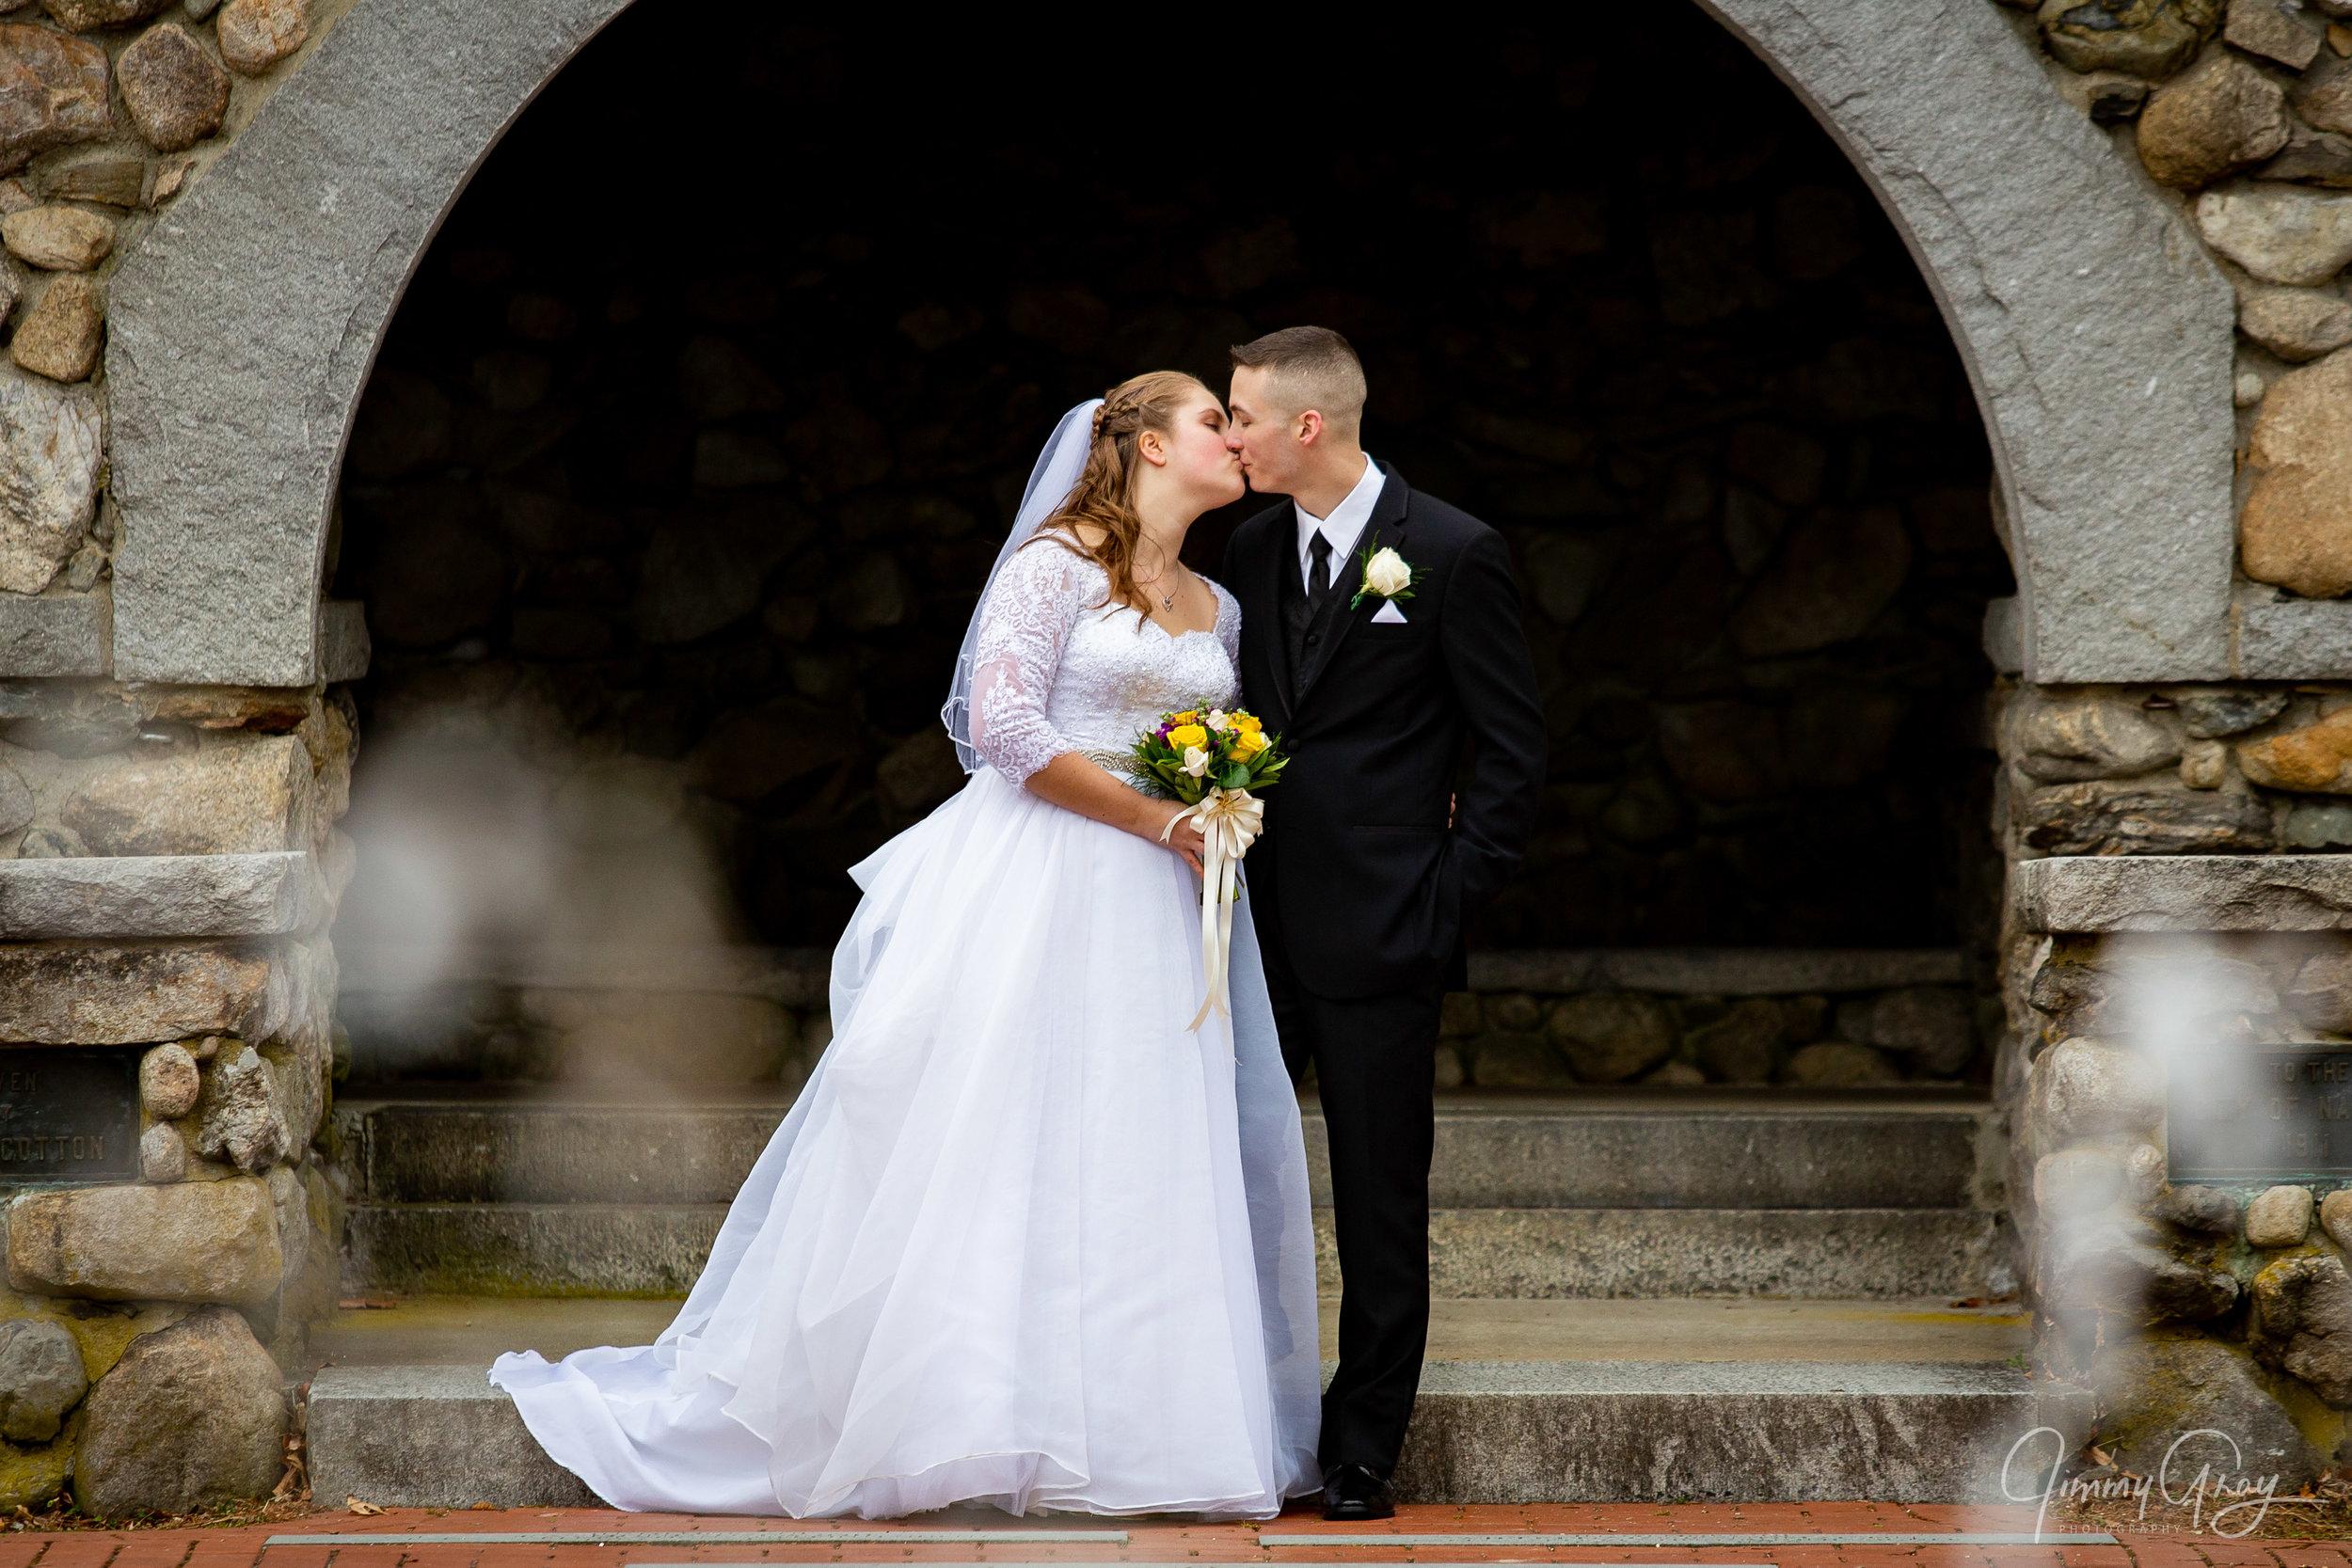 NH Wedding Photography - Jimmy Gray Photo - Nashua, NH - Greeley Park - Shot For MRD Photography